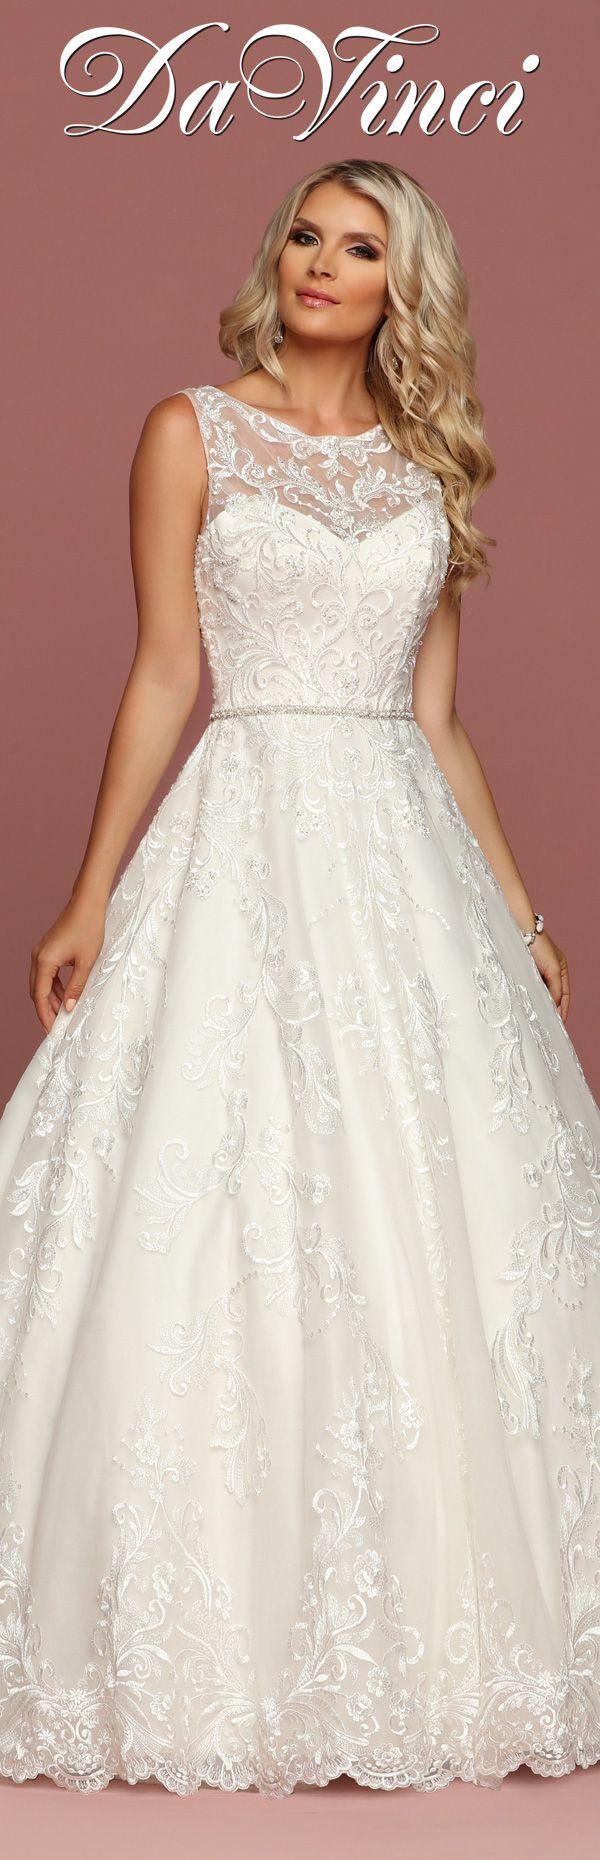 536 best DaVinci Bridal images on Pinterest